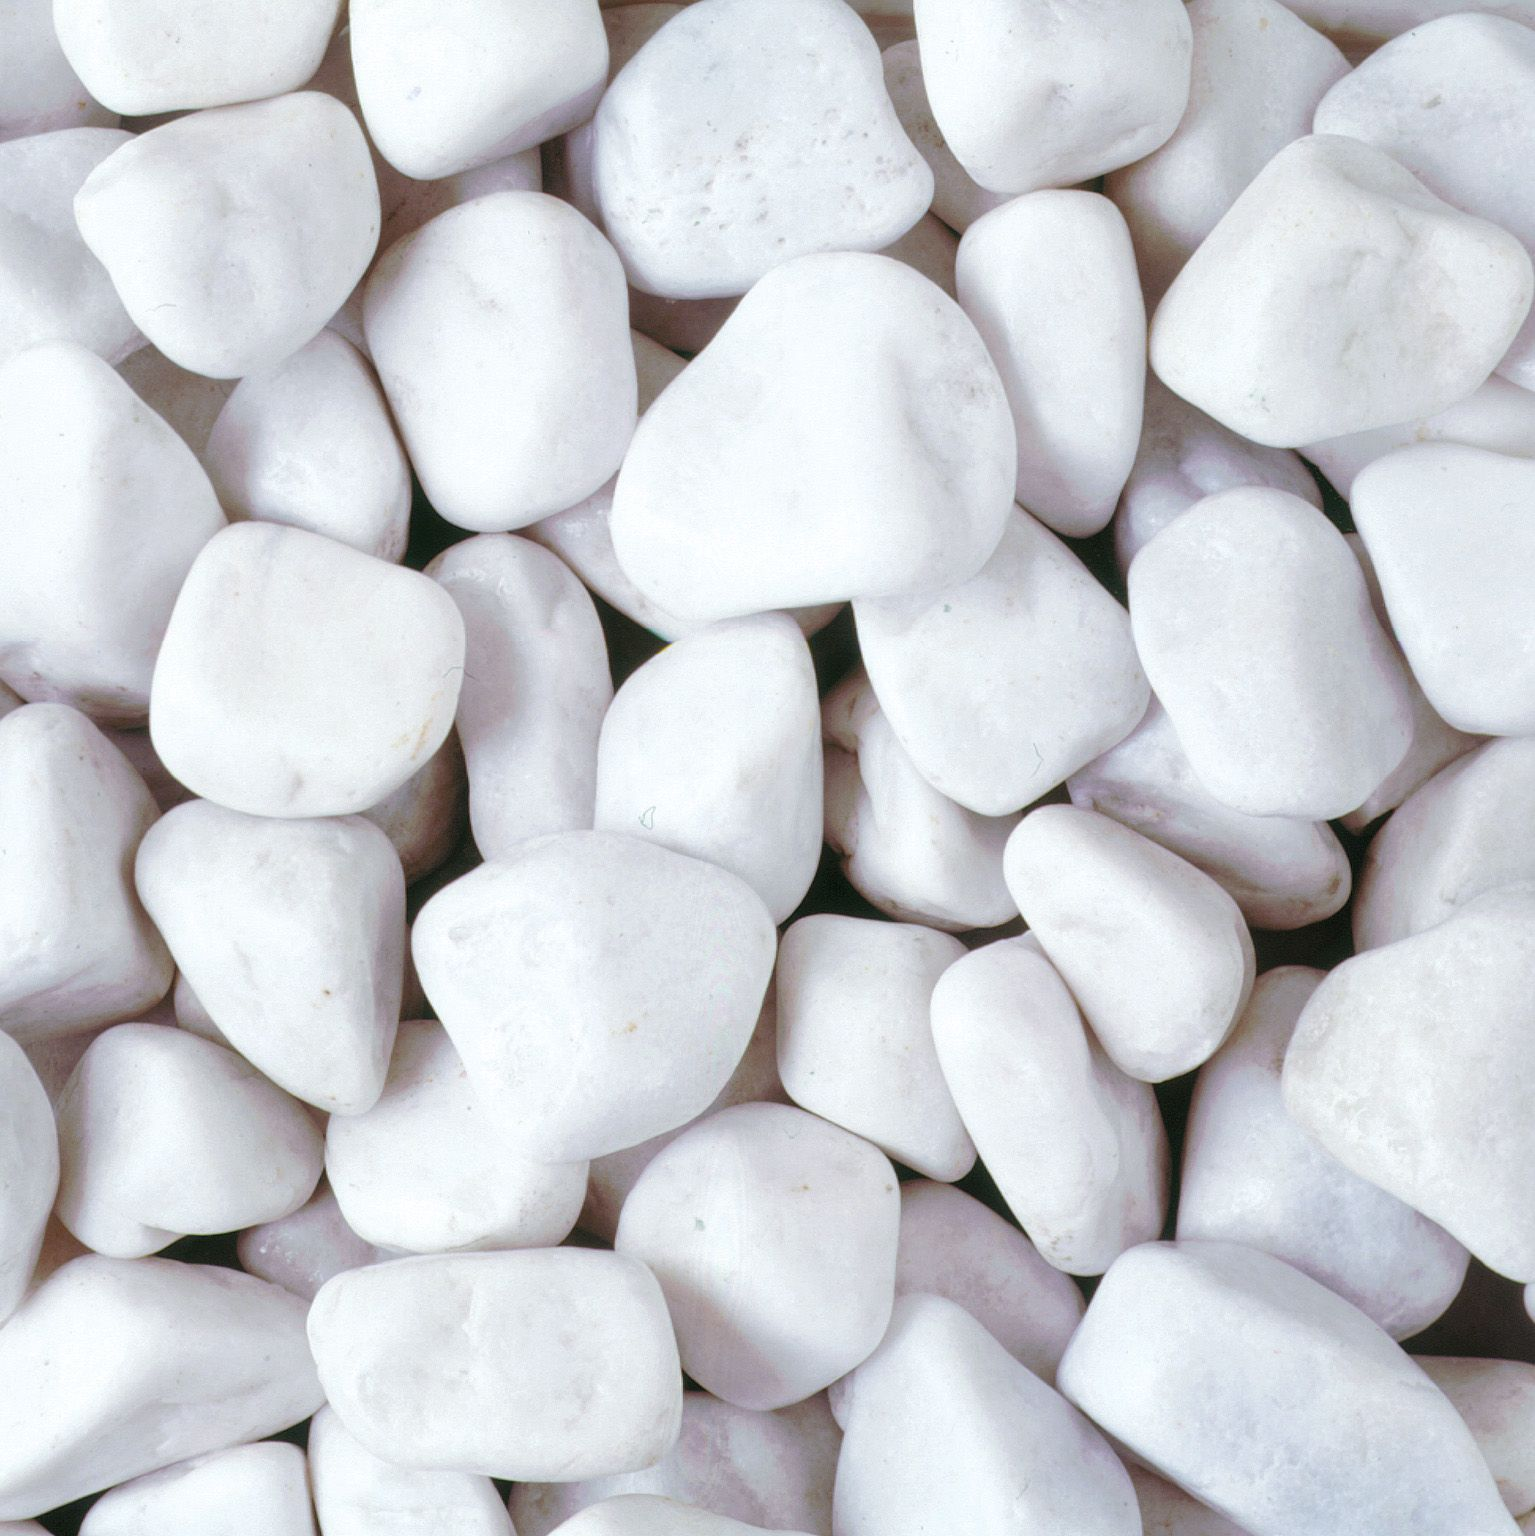 Polar White Pebbles White Spar Pebbles Spanish White Pebbles White Pebbles White Stone White Gravel Plum Slate White Pebbles